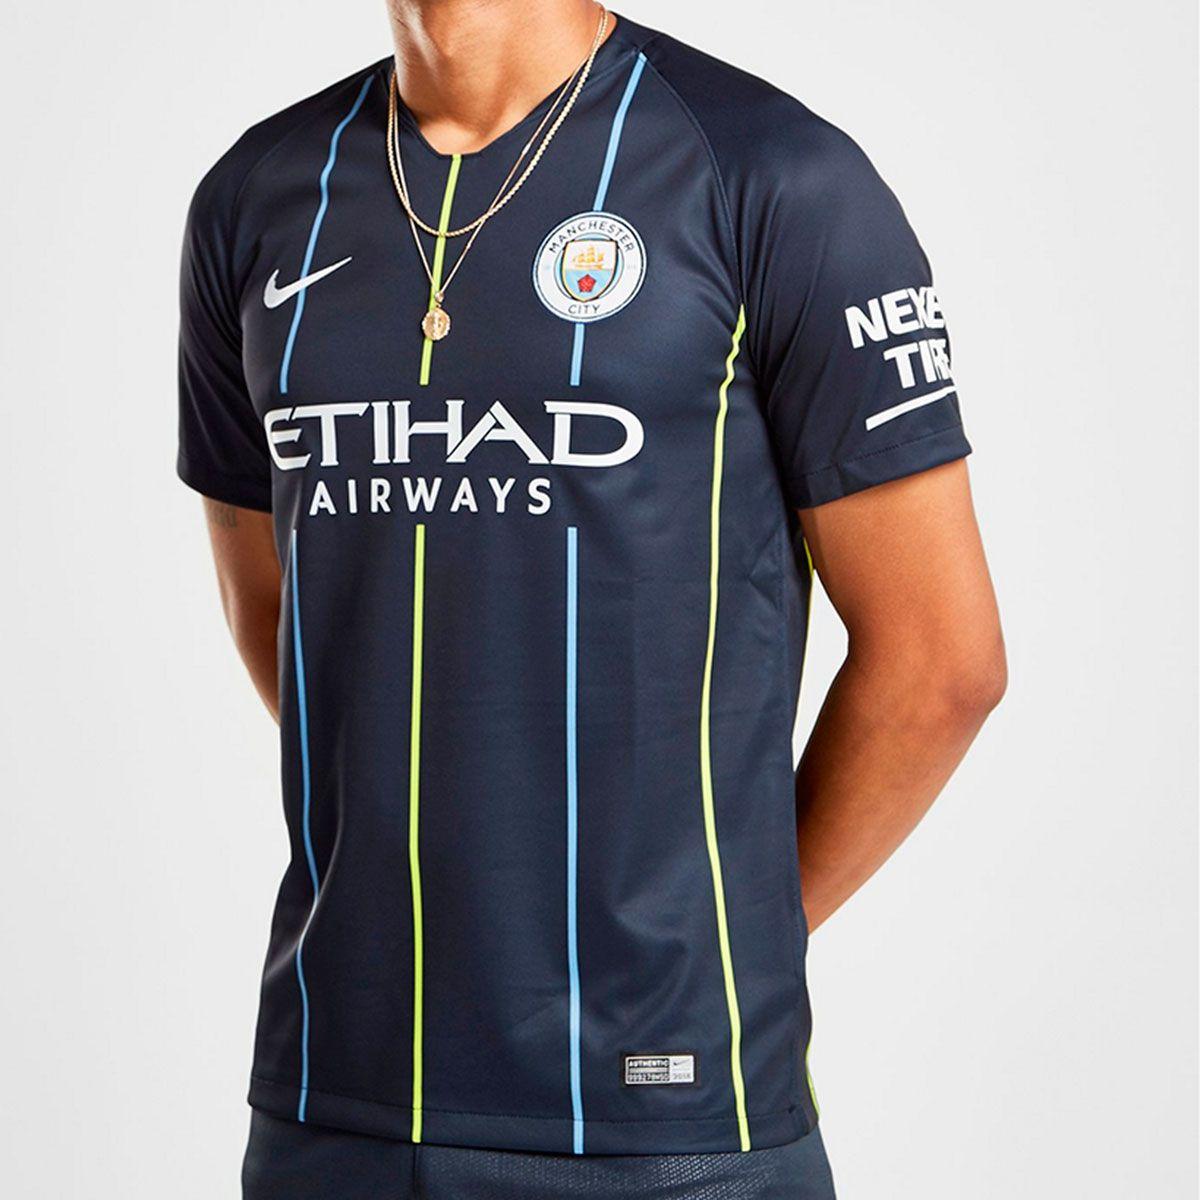 15852ef4b607a Camisa Manchester City II Nike 2018/19